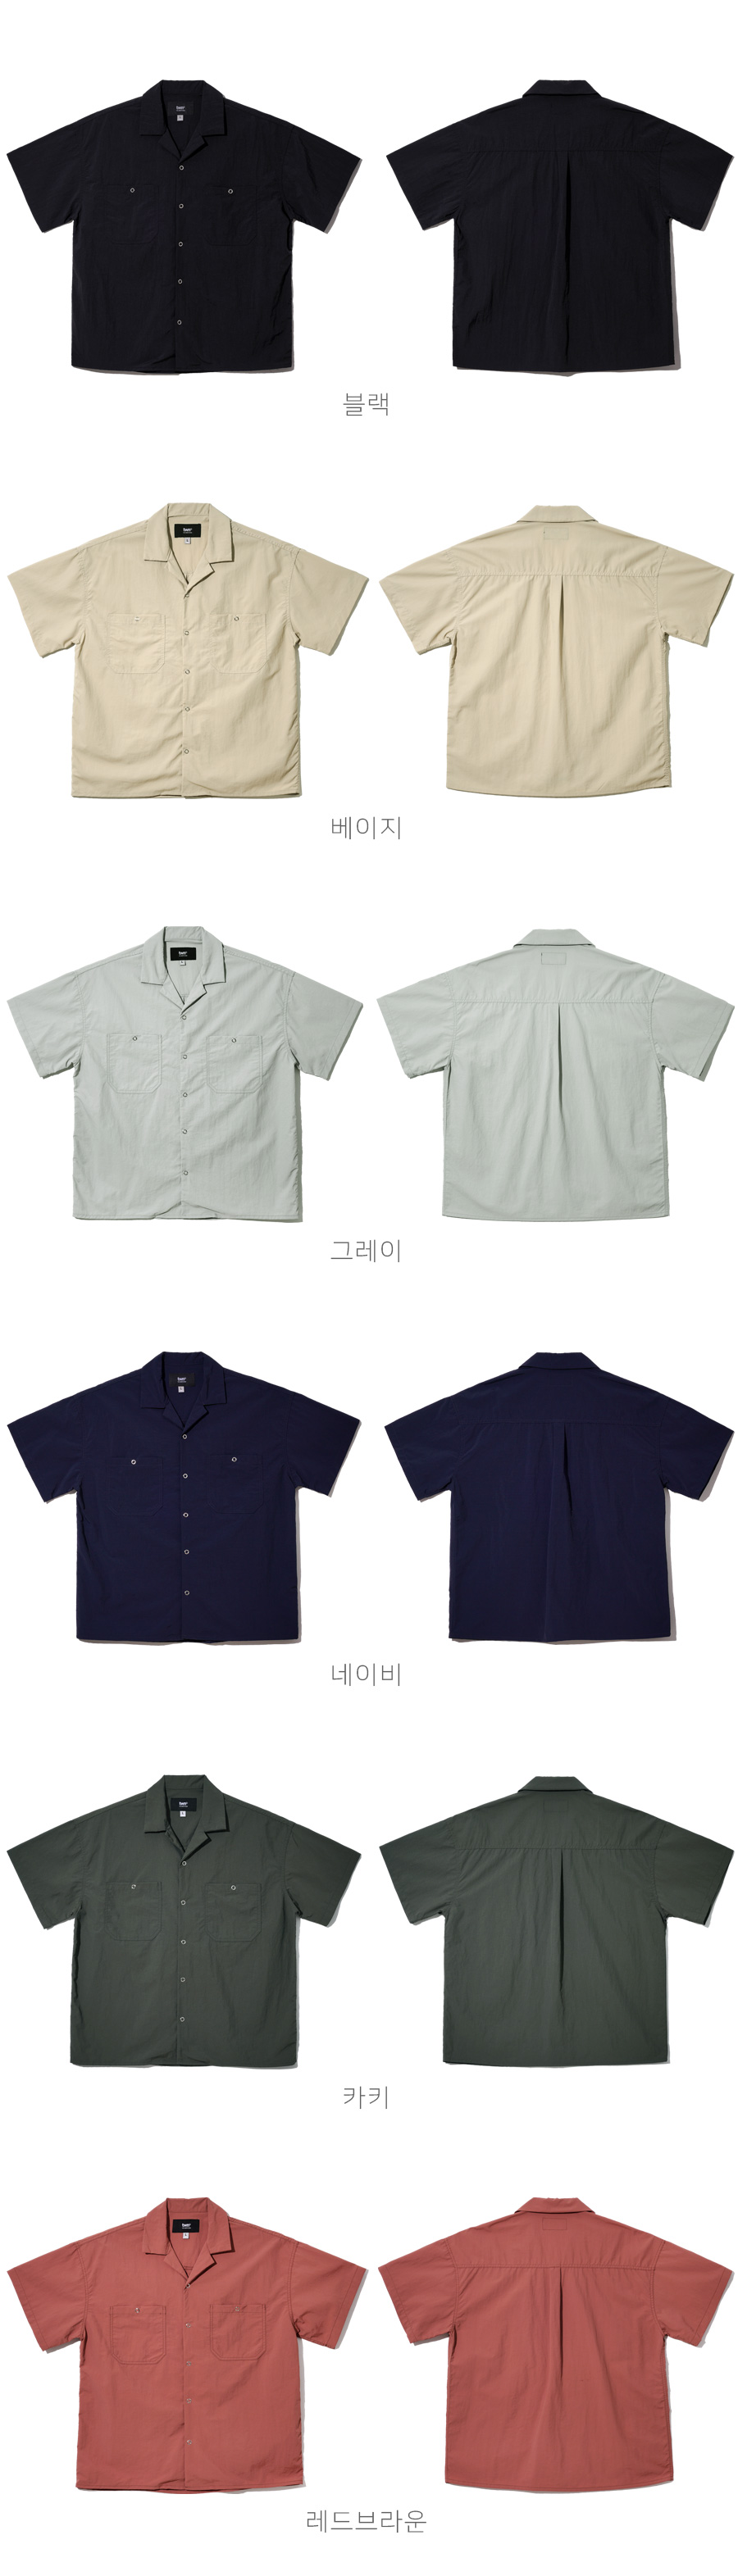 20200325_twn_ferment_set_detail_shirts_lm_01.jpg